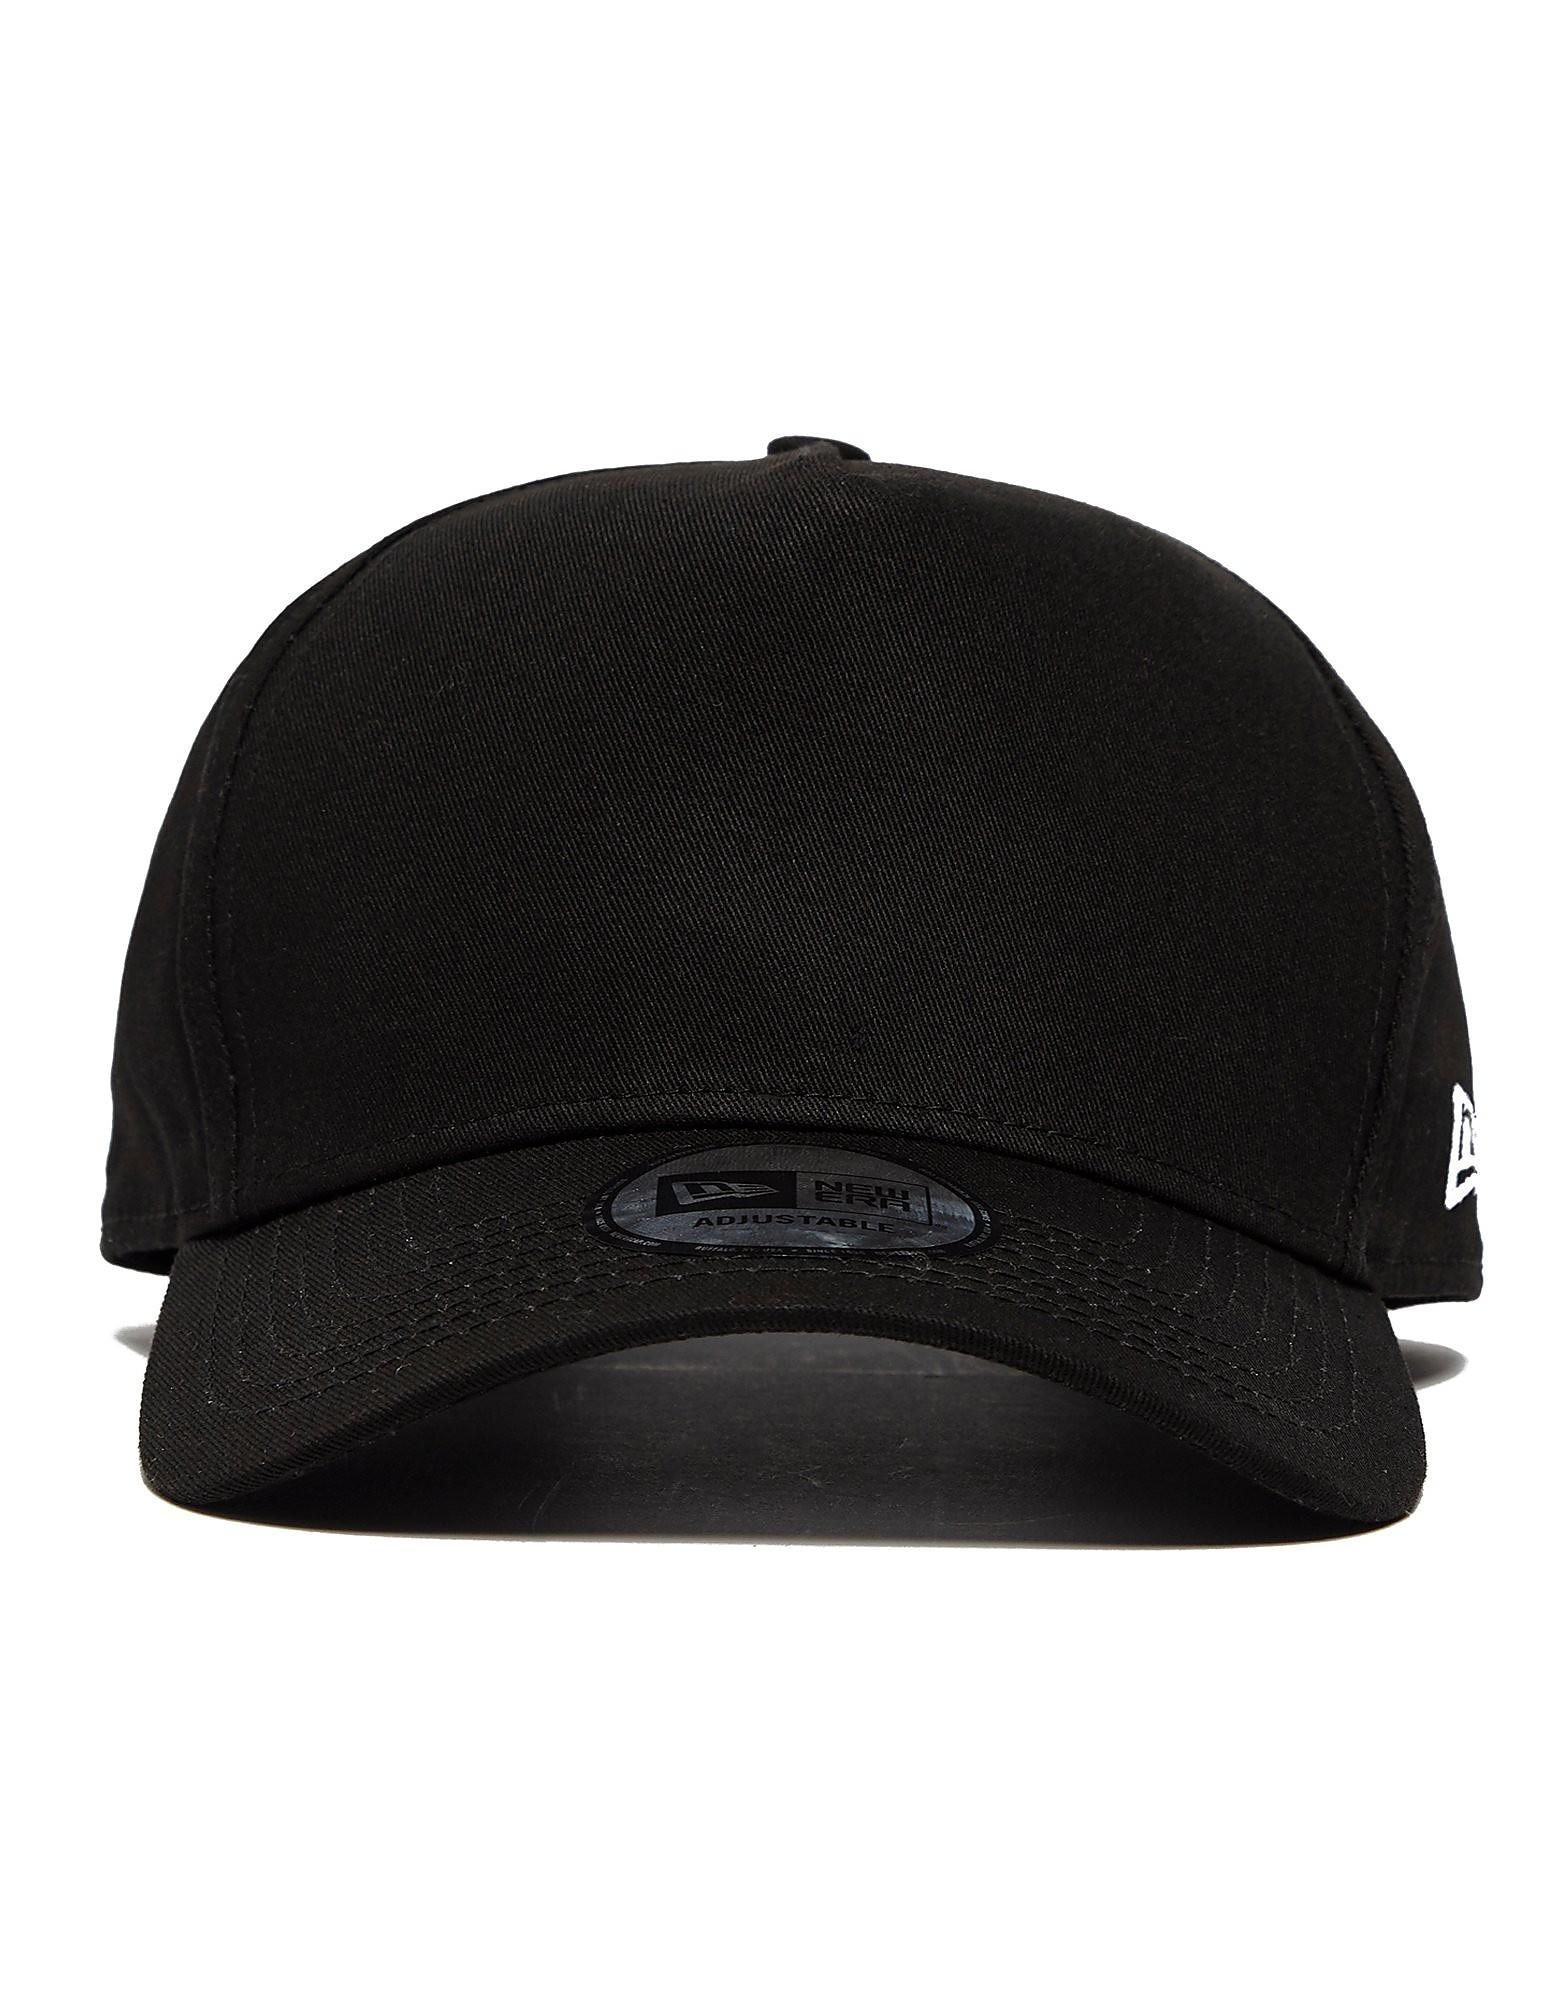 New Era A-Frame Cap